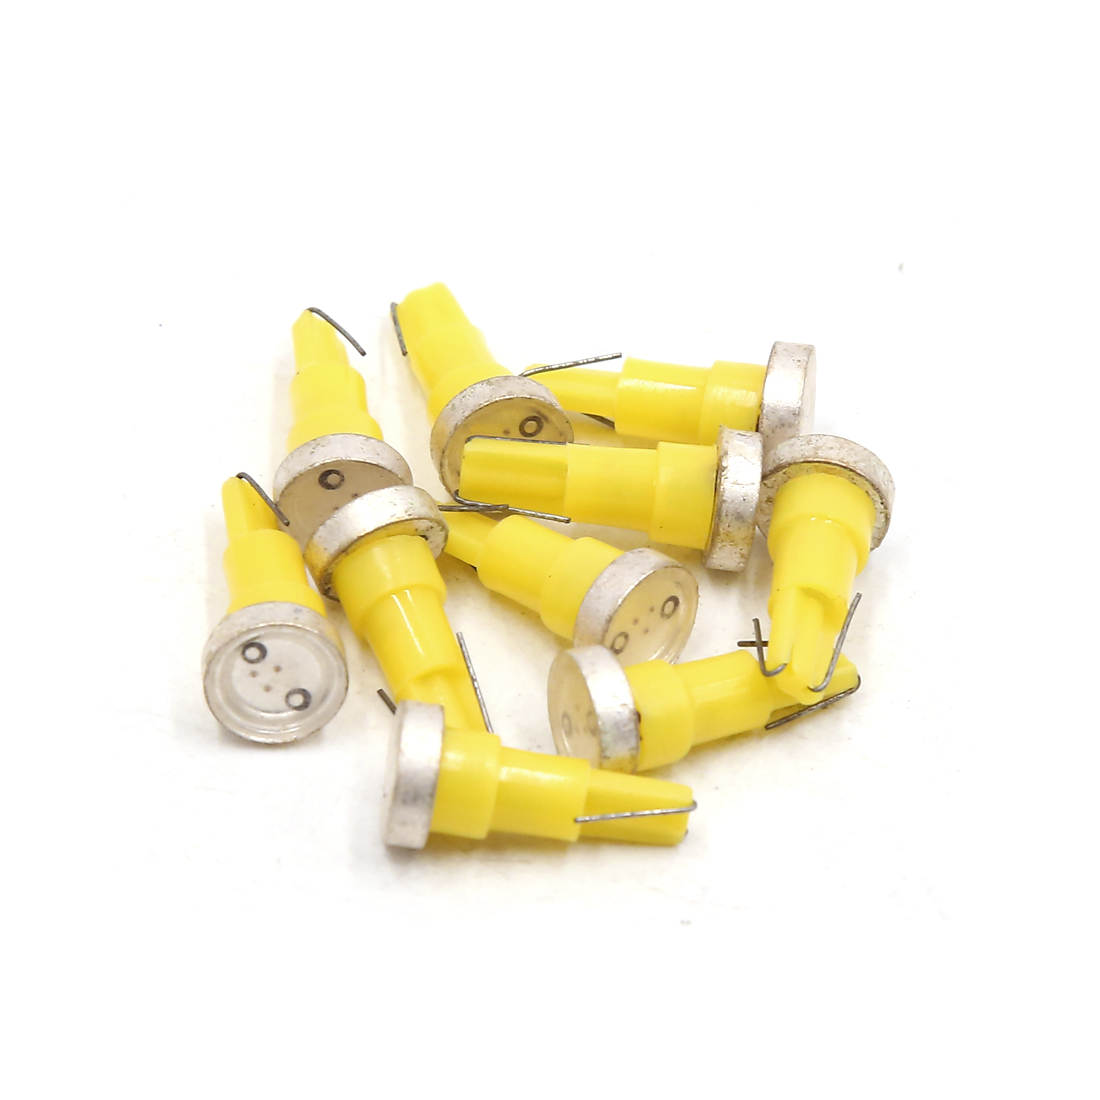 10Pcs T5 1W Yellow LED Car Dashboard Panel Light Interior 74 79 85 86 206 207